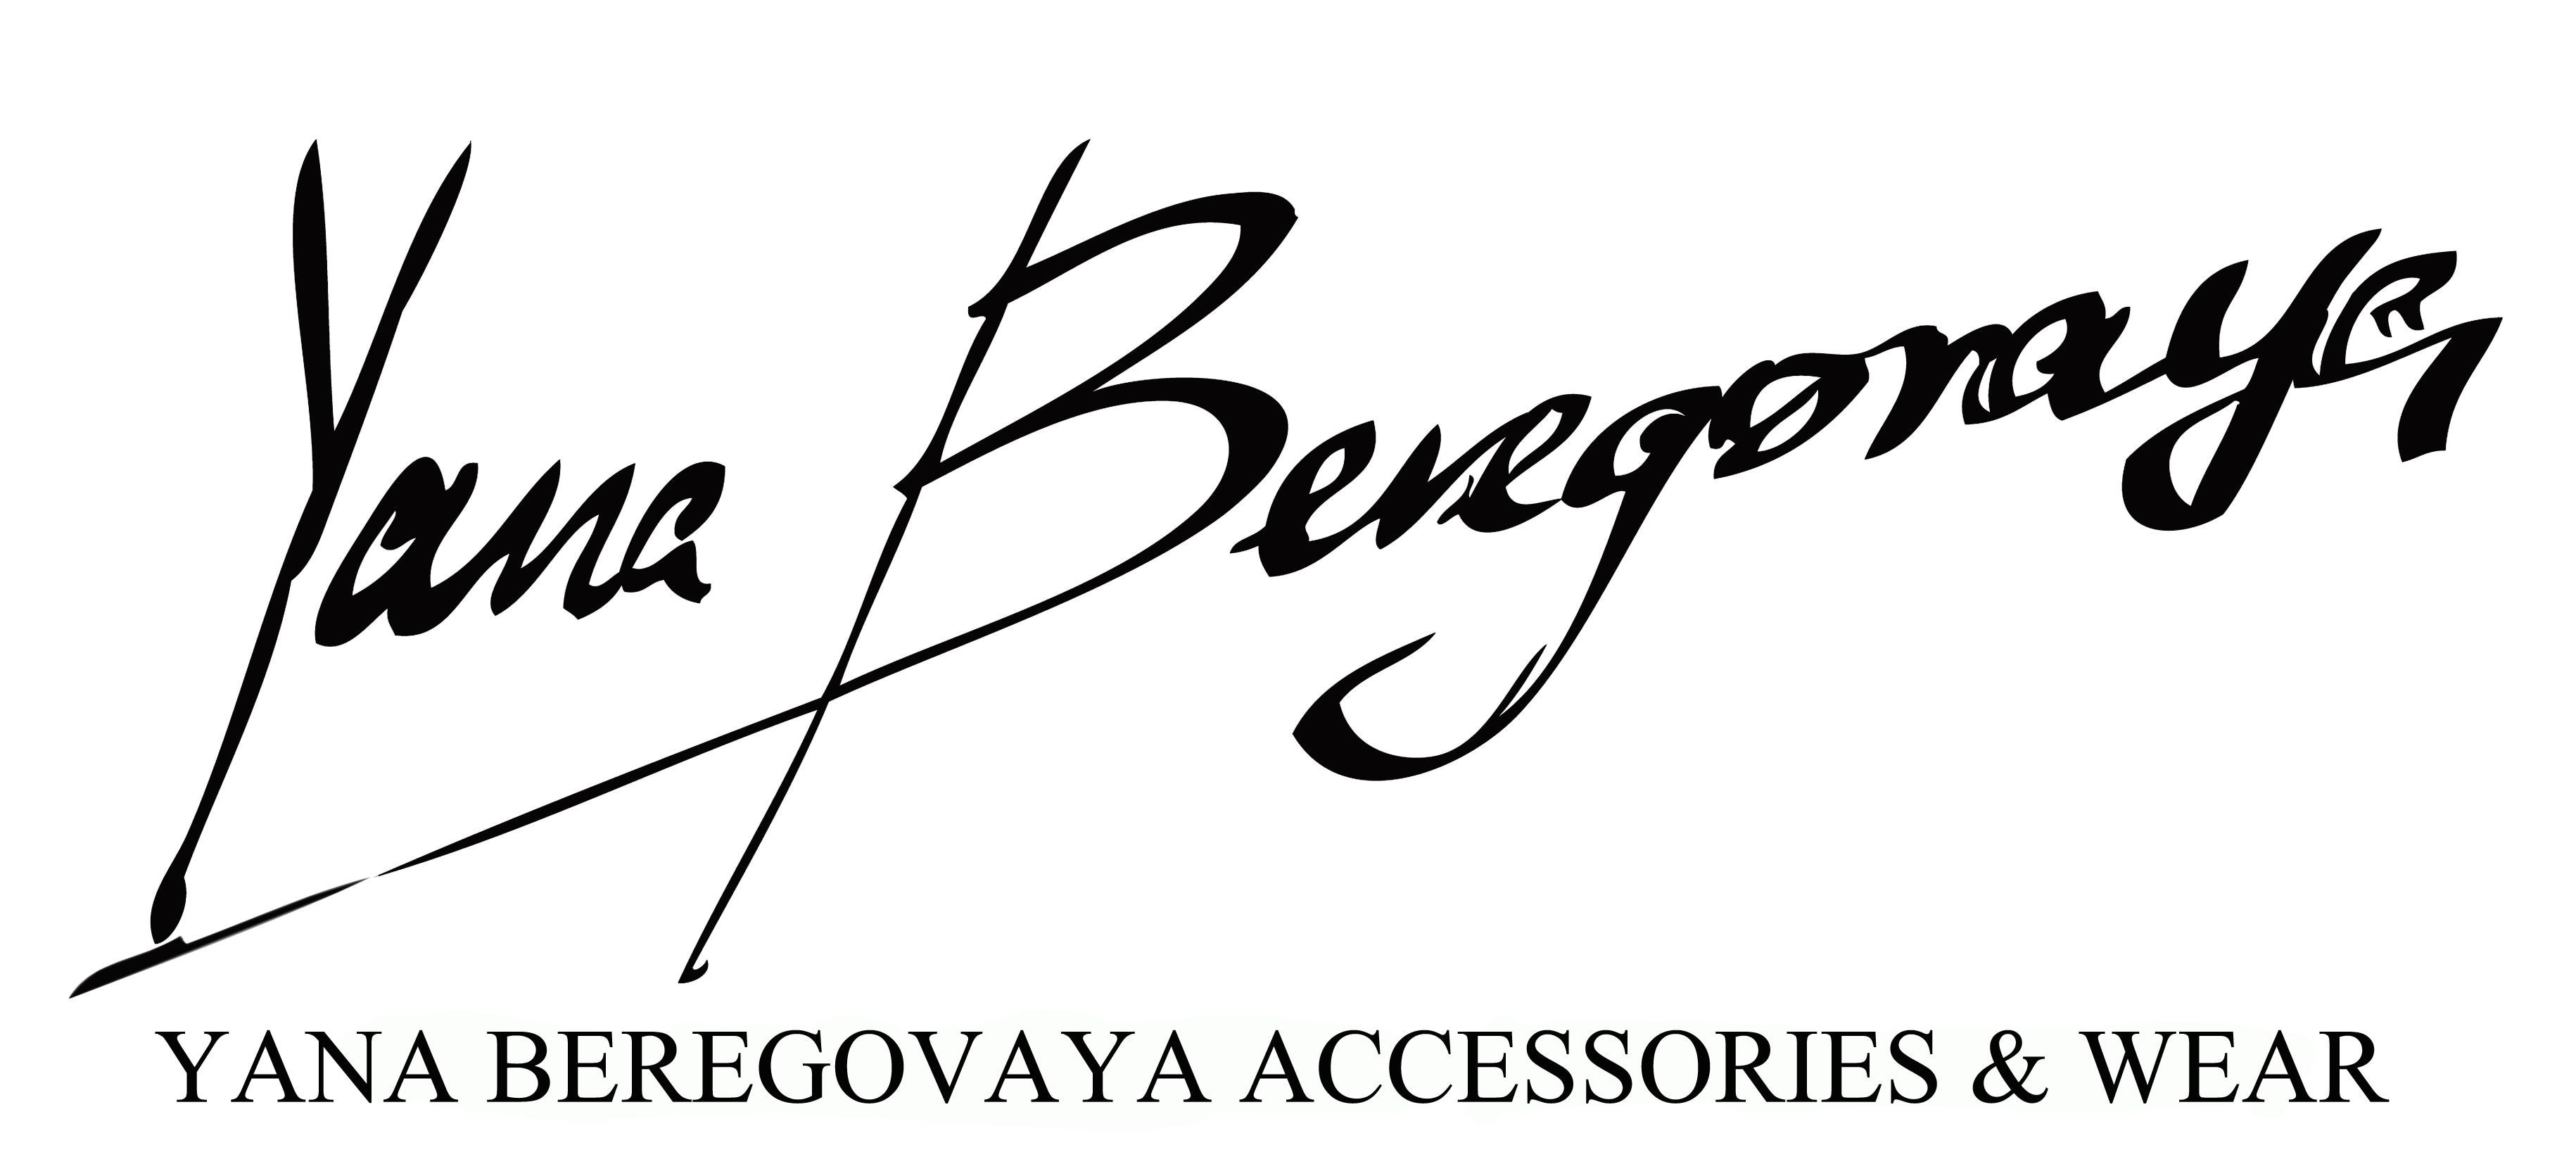 Onlain-магазин Yana Beregovaya